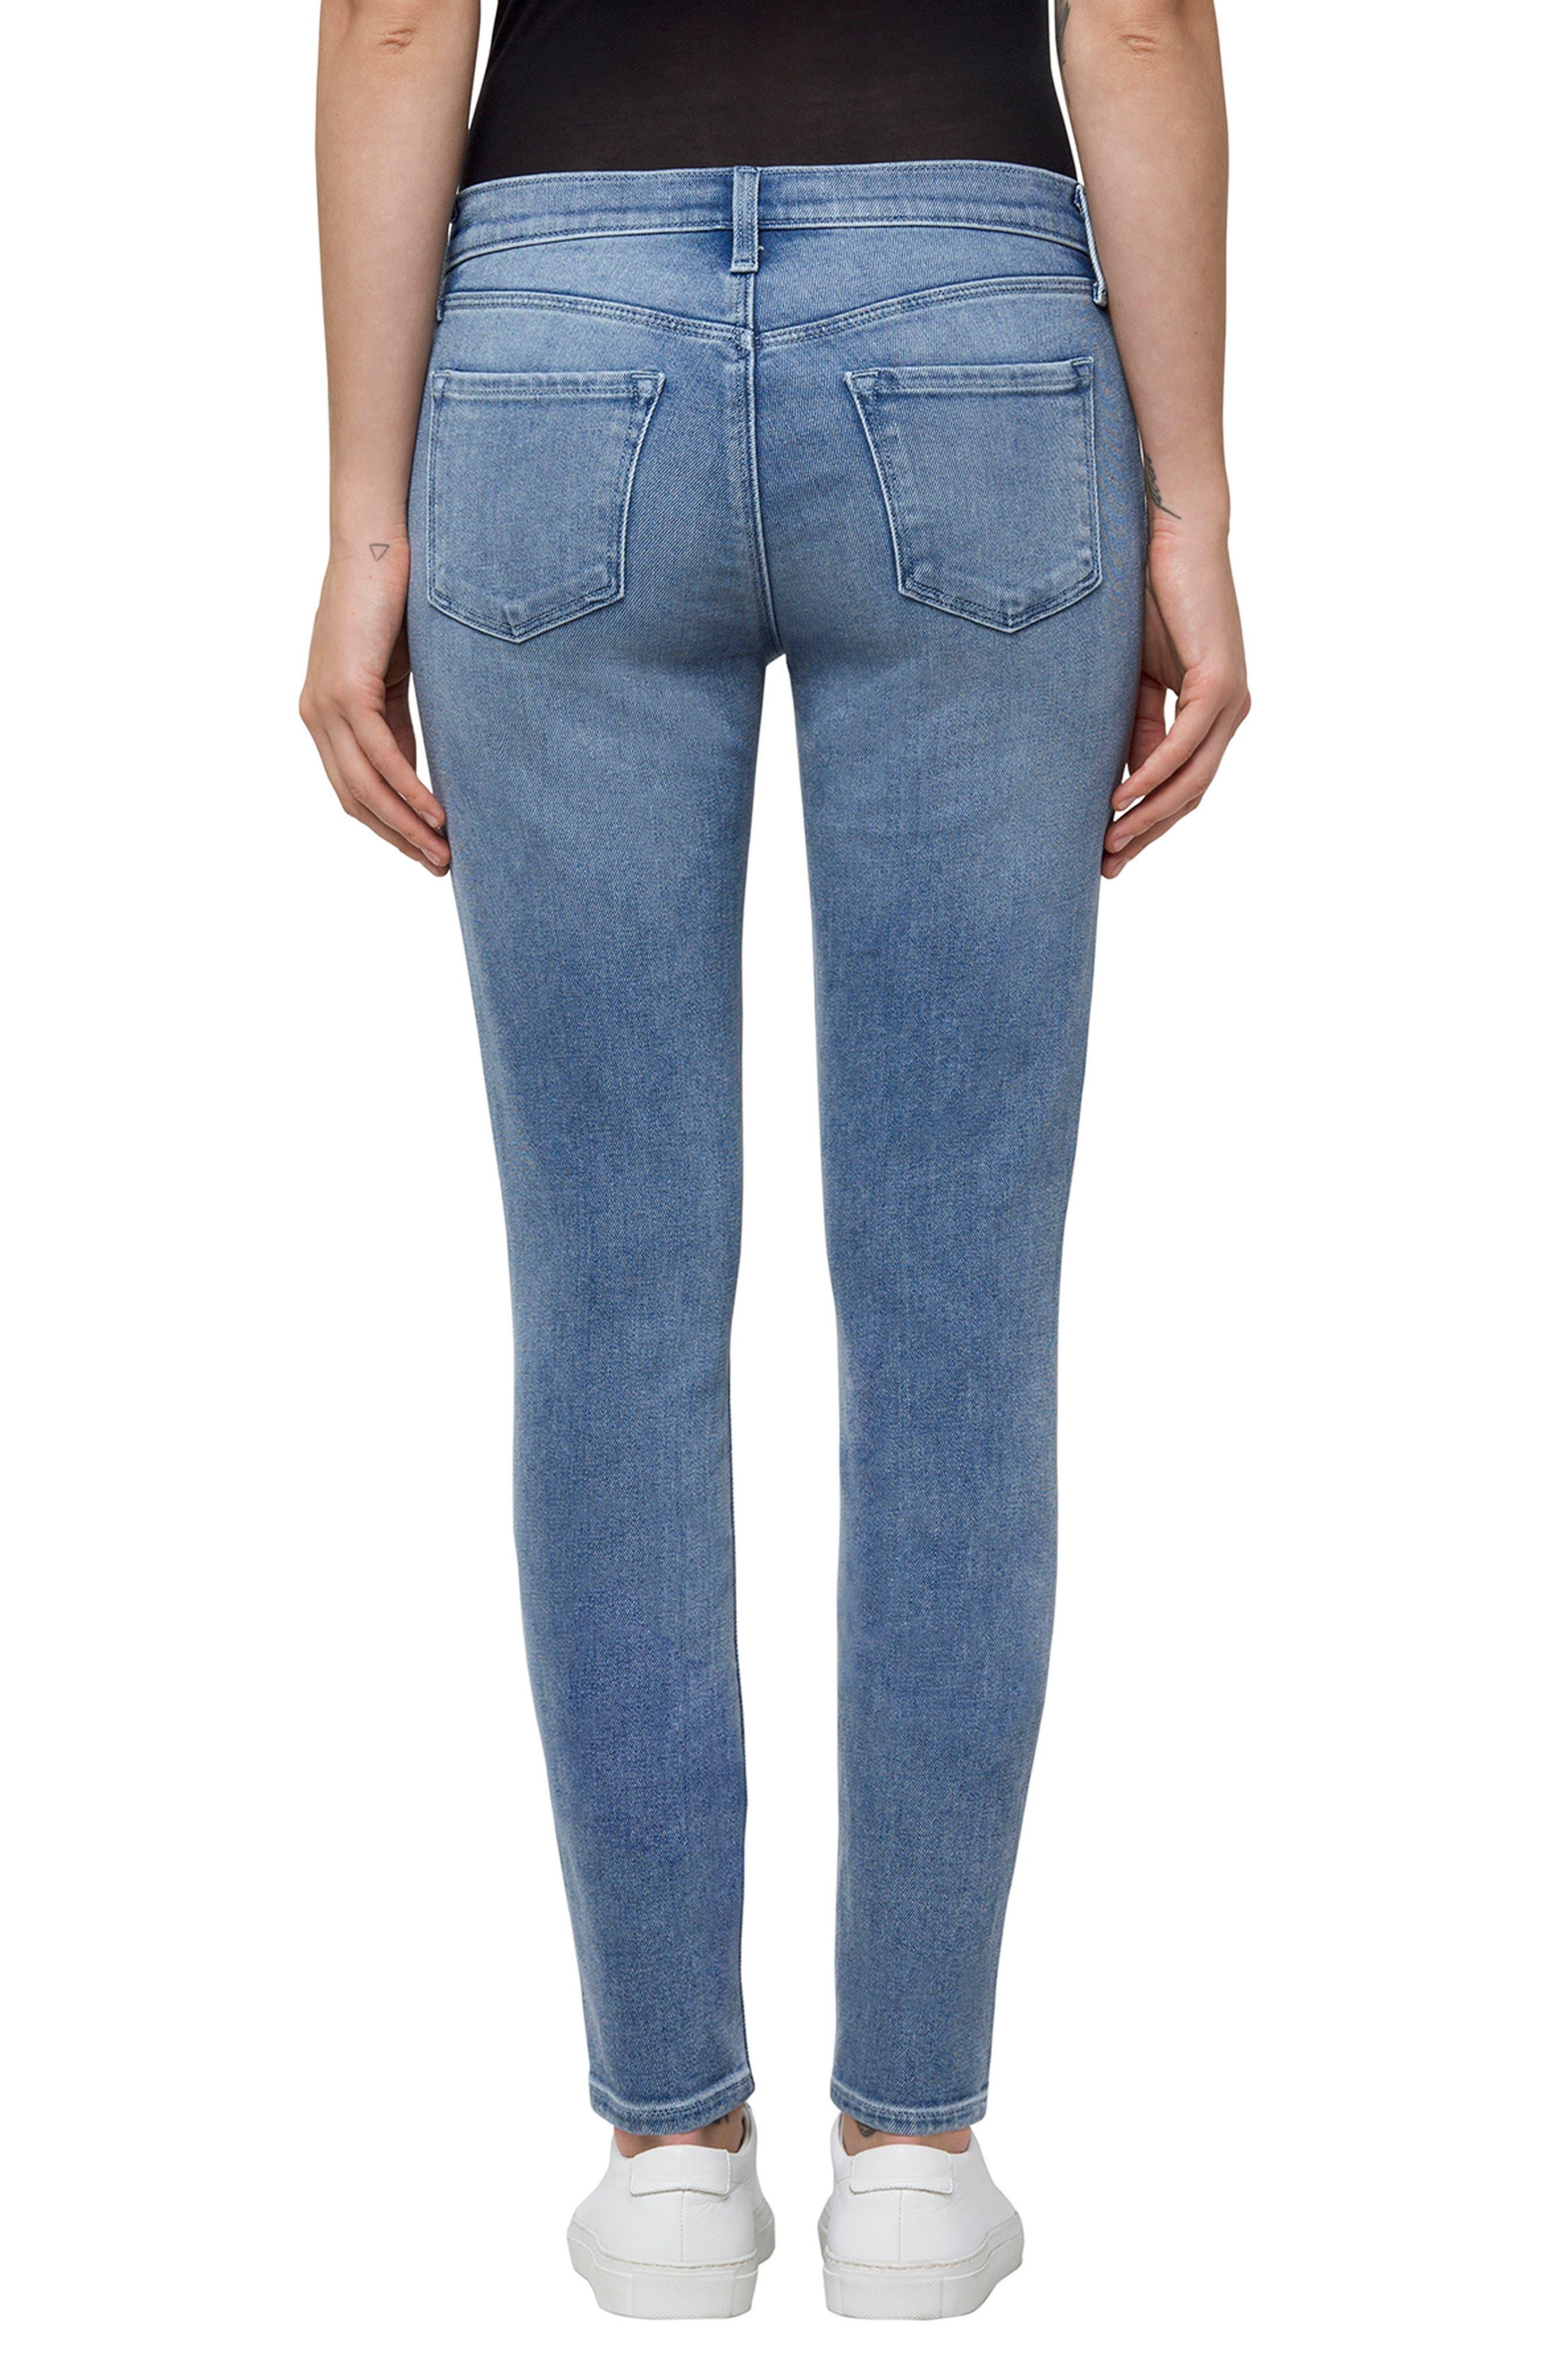 811 Skinny Jeans,                             Alternate thumbnail 2, color,                             Utopia